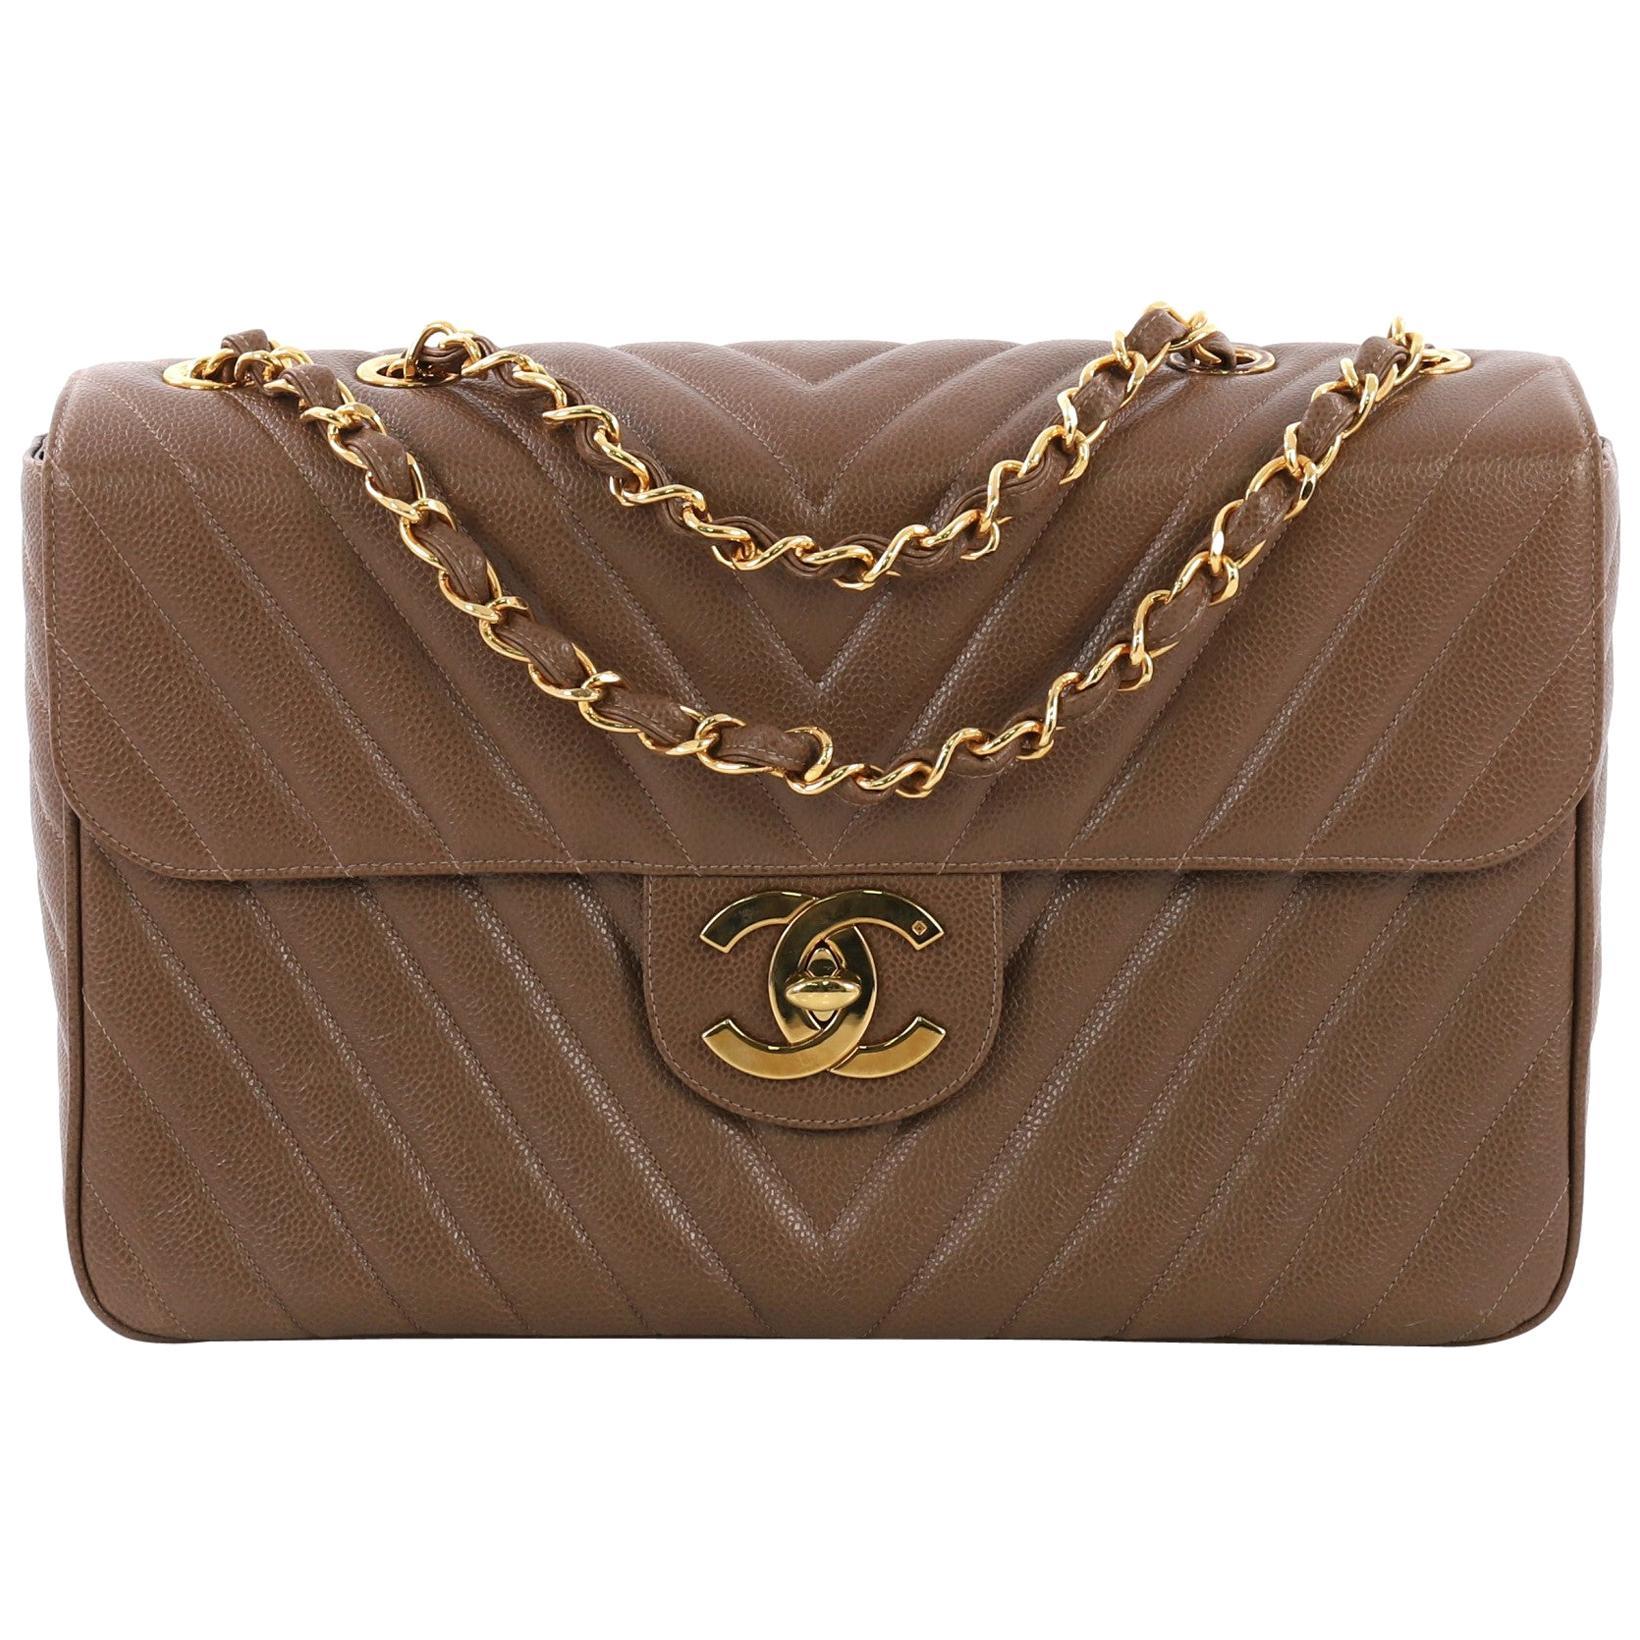 20566a59aee7c2 Vintage Chanel Purses and Handbags at 1stdibs